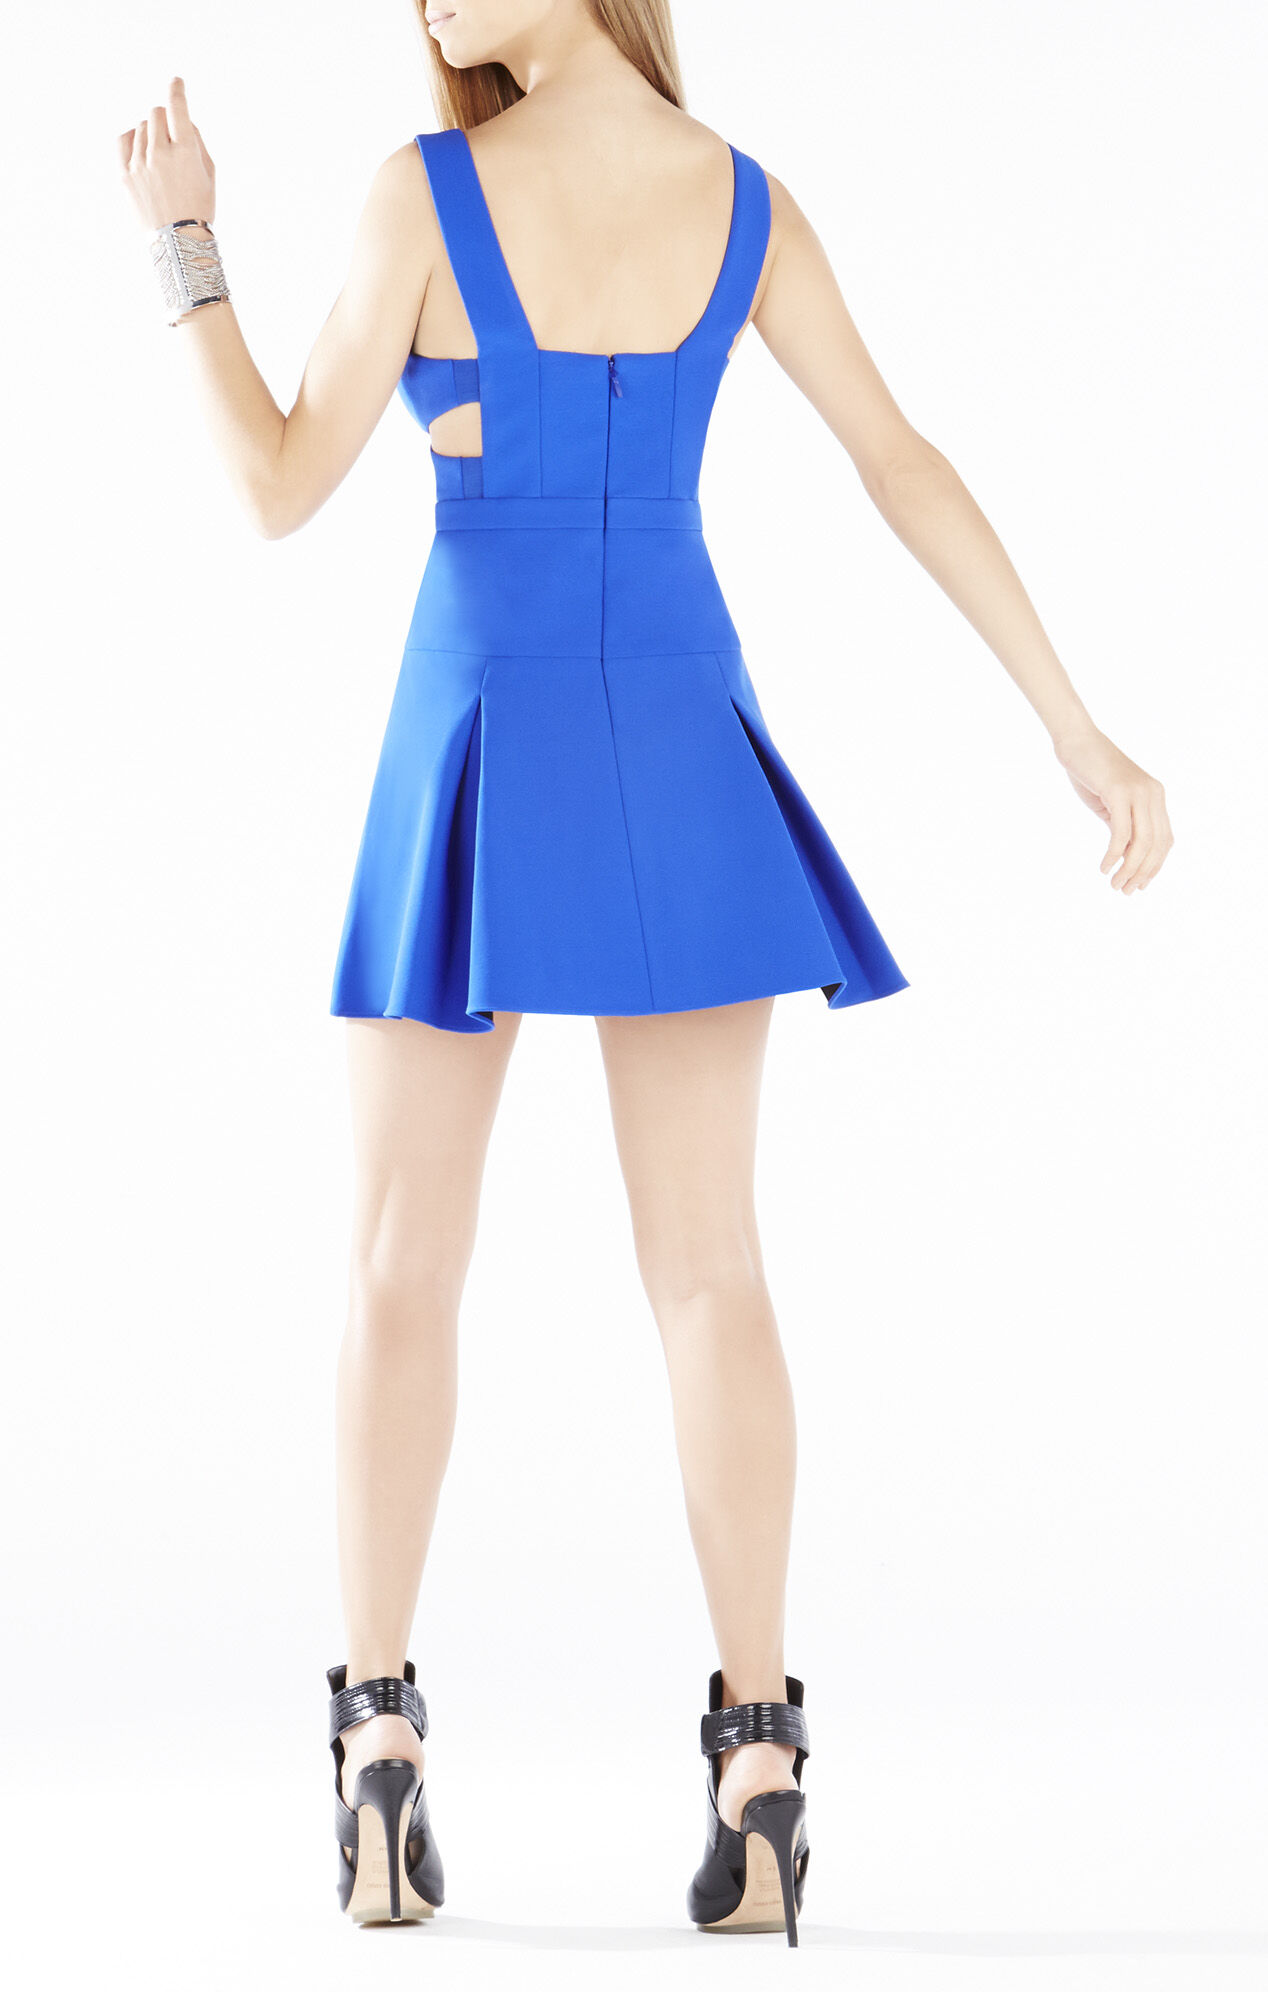 Harlie Cutout Cross Bodice Dress